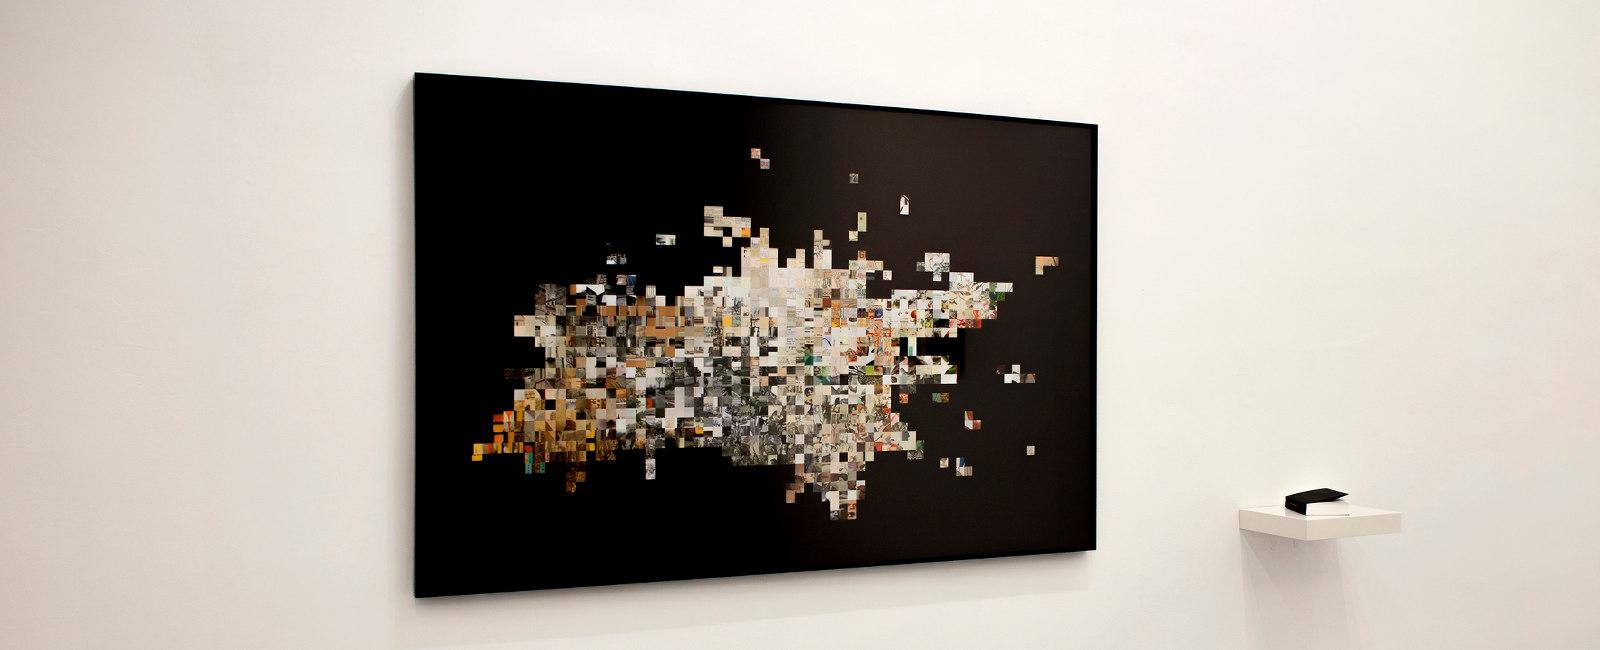 maquina-abstracta-1600×650